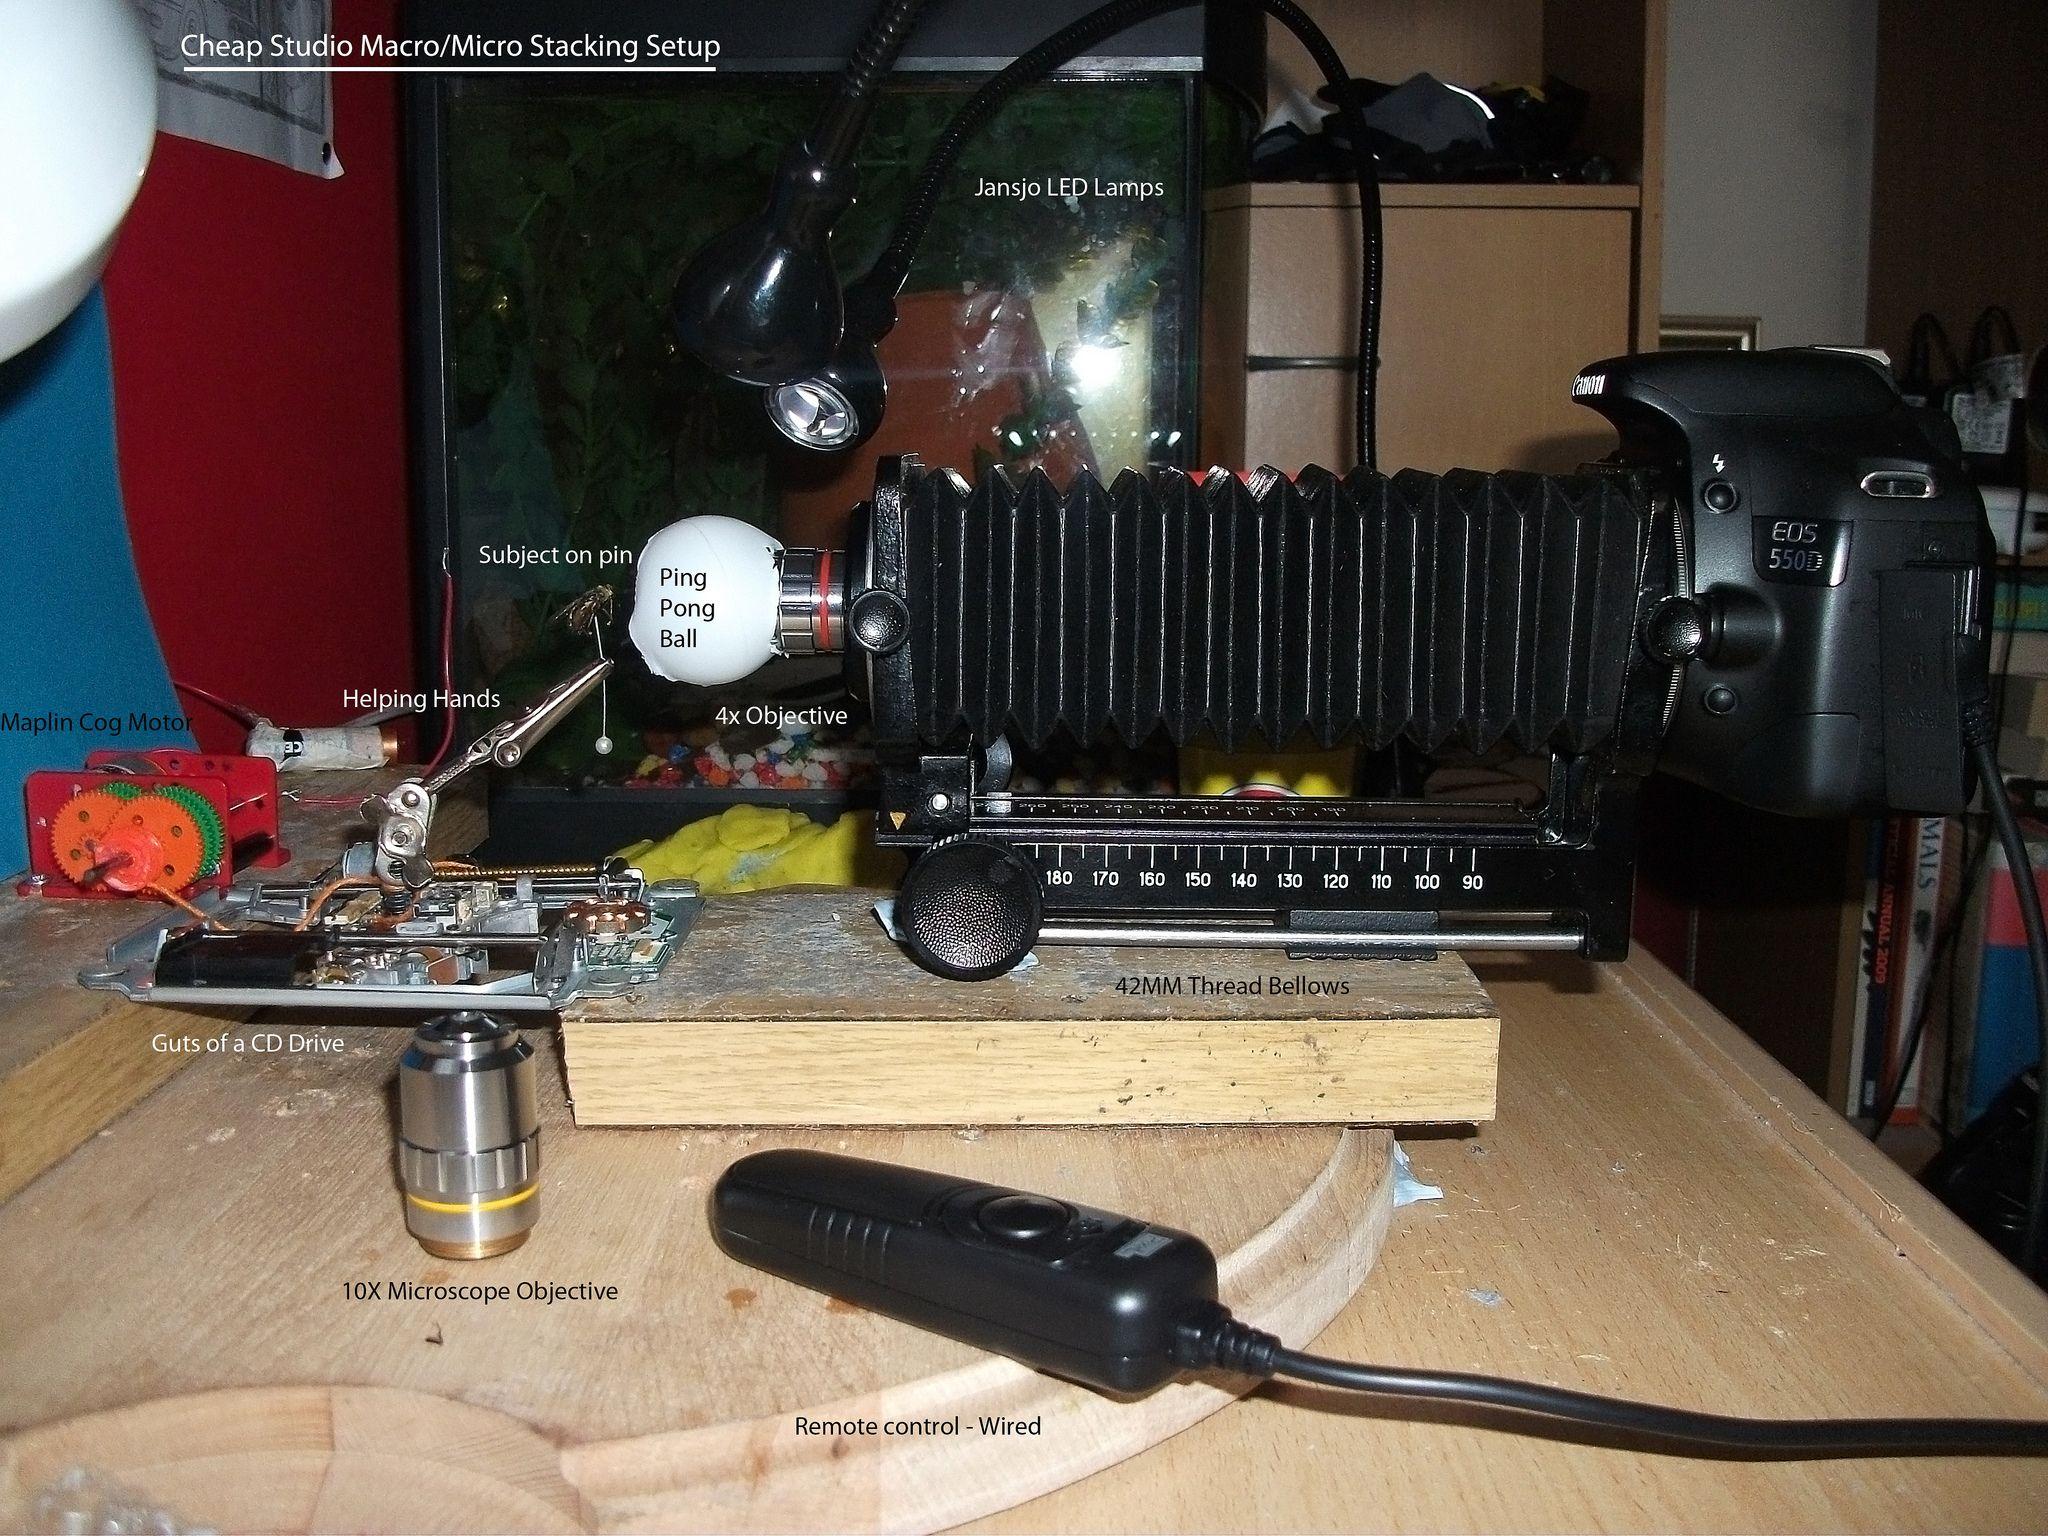 Cheap Macro Micro Studio Stacking Photography Setup. Cheap Macro Micro Studio Stacking Photography Setup   Macro